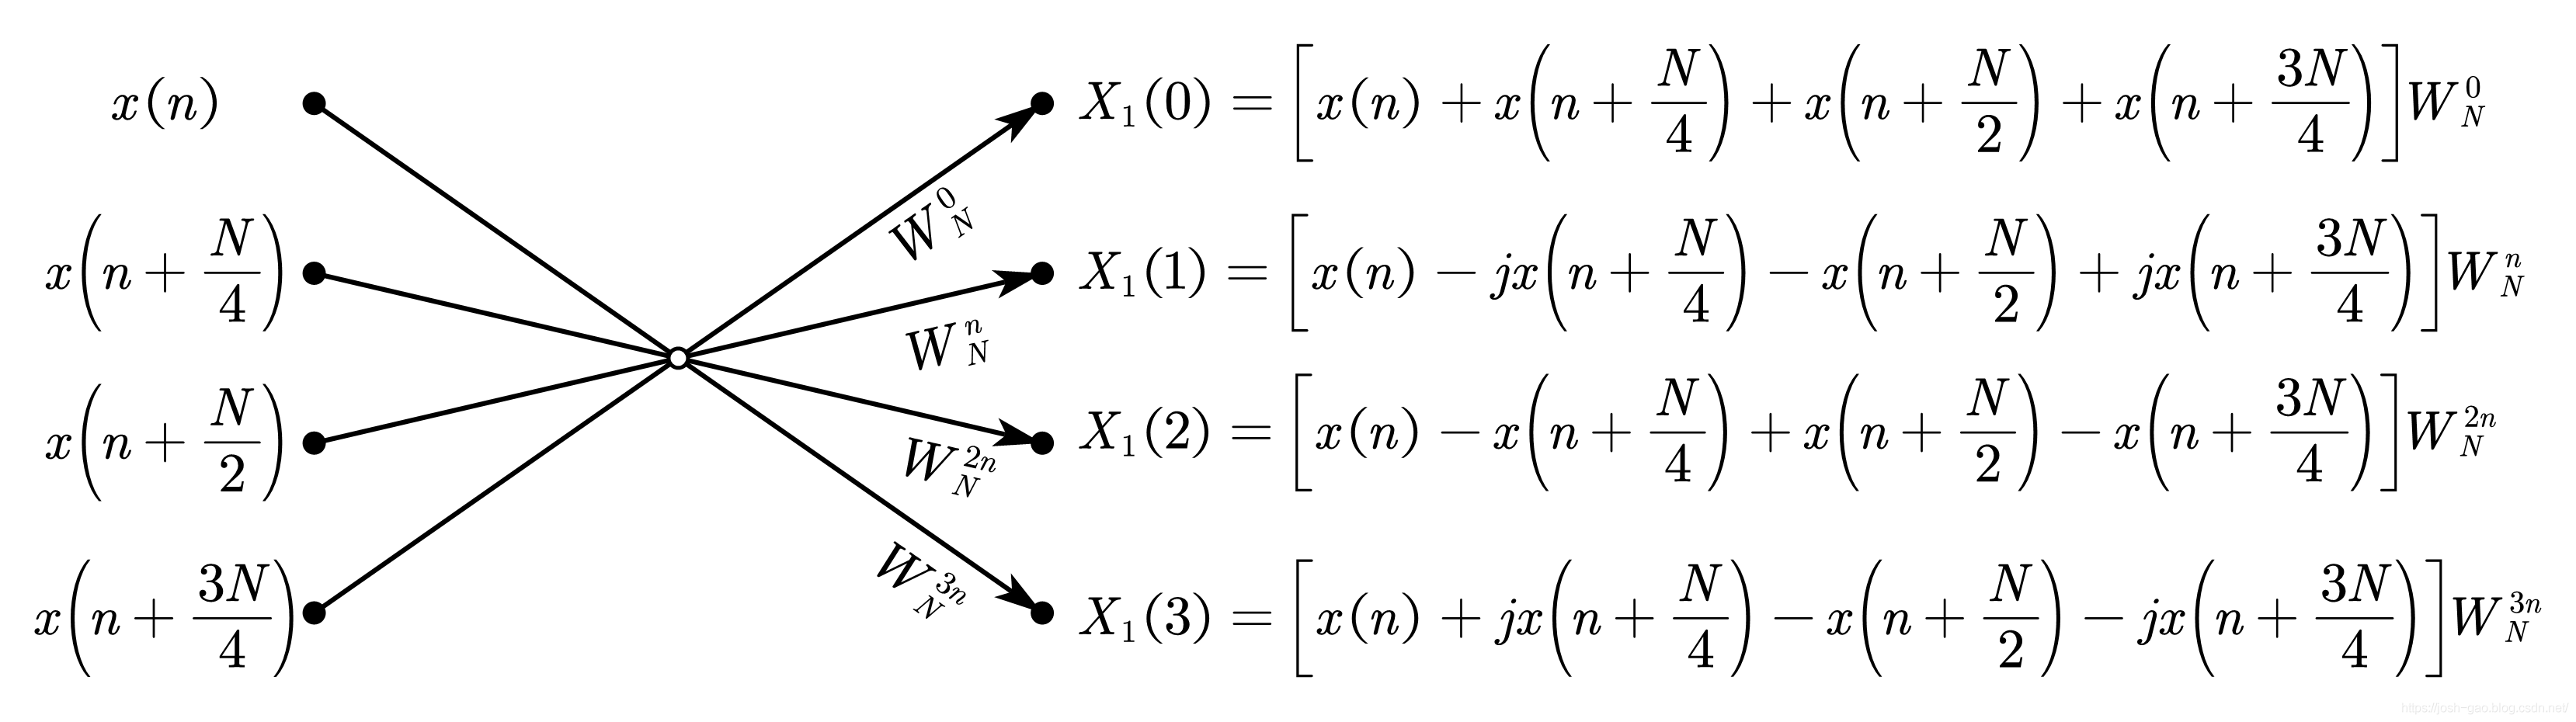 基-4 DIF-FFT 简化蝶形